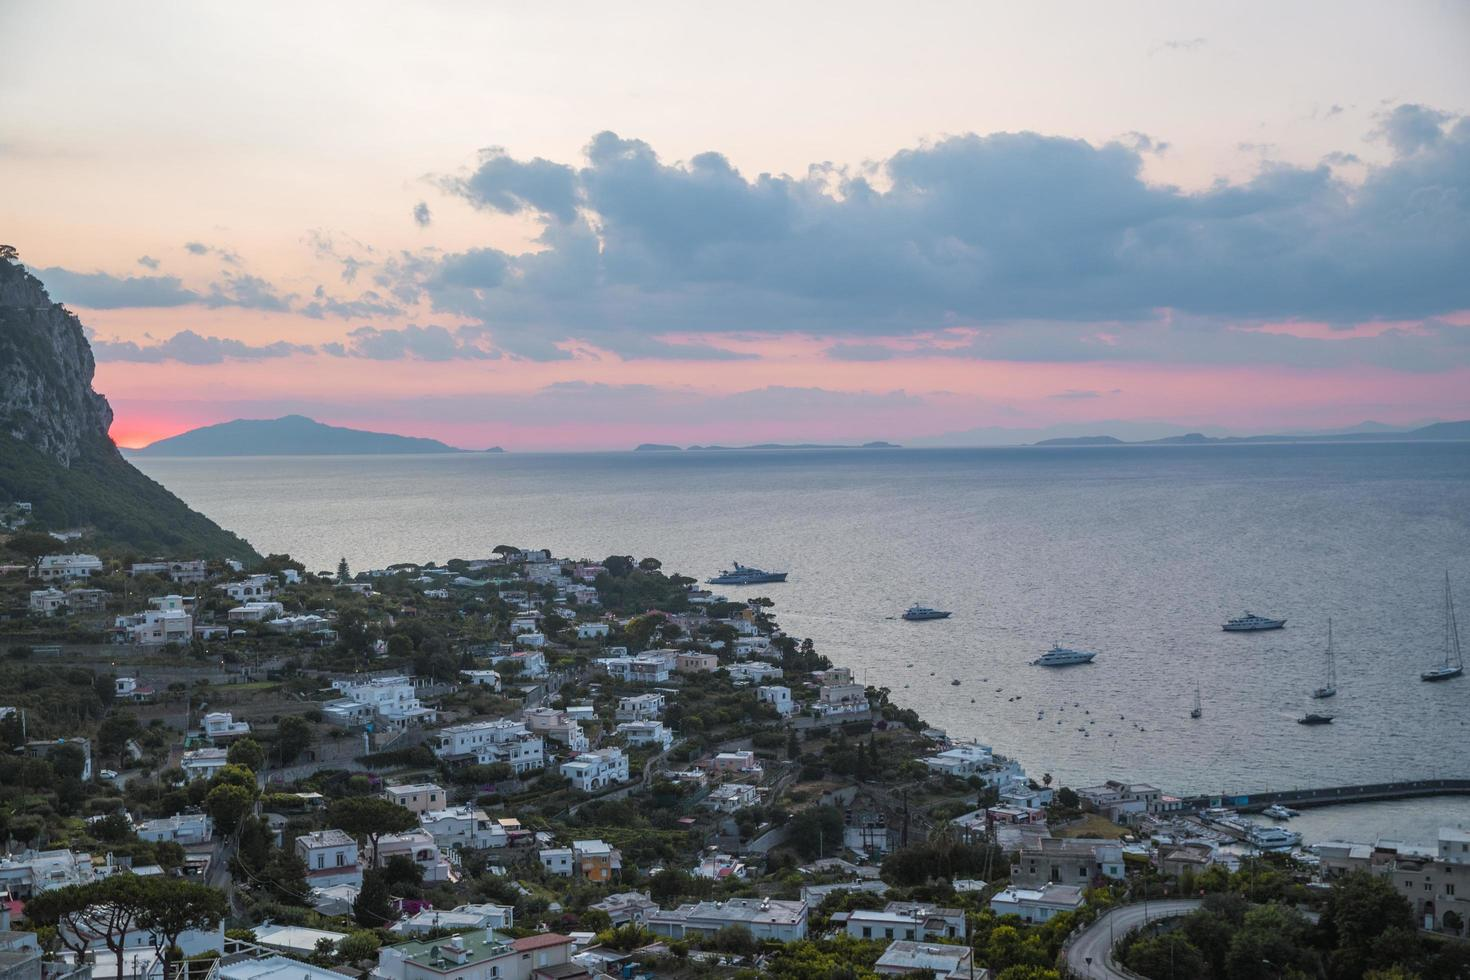 puesta de sol en capri, italia foto